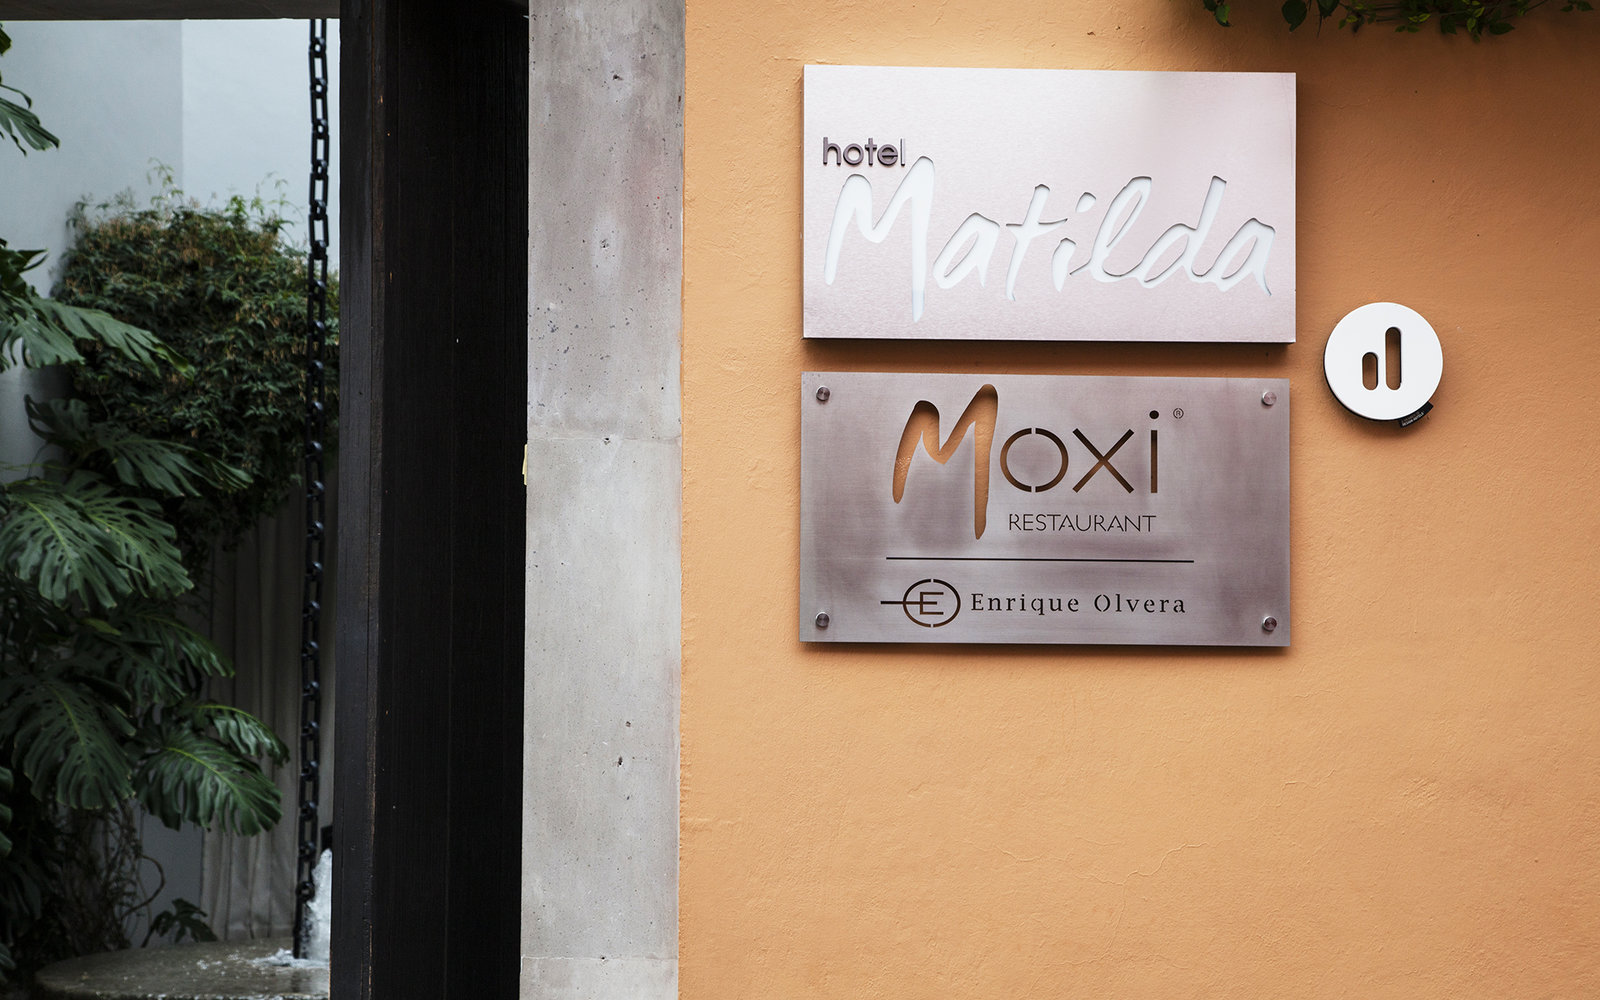 Moxi Restaurant